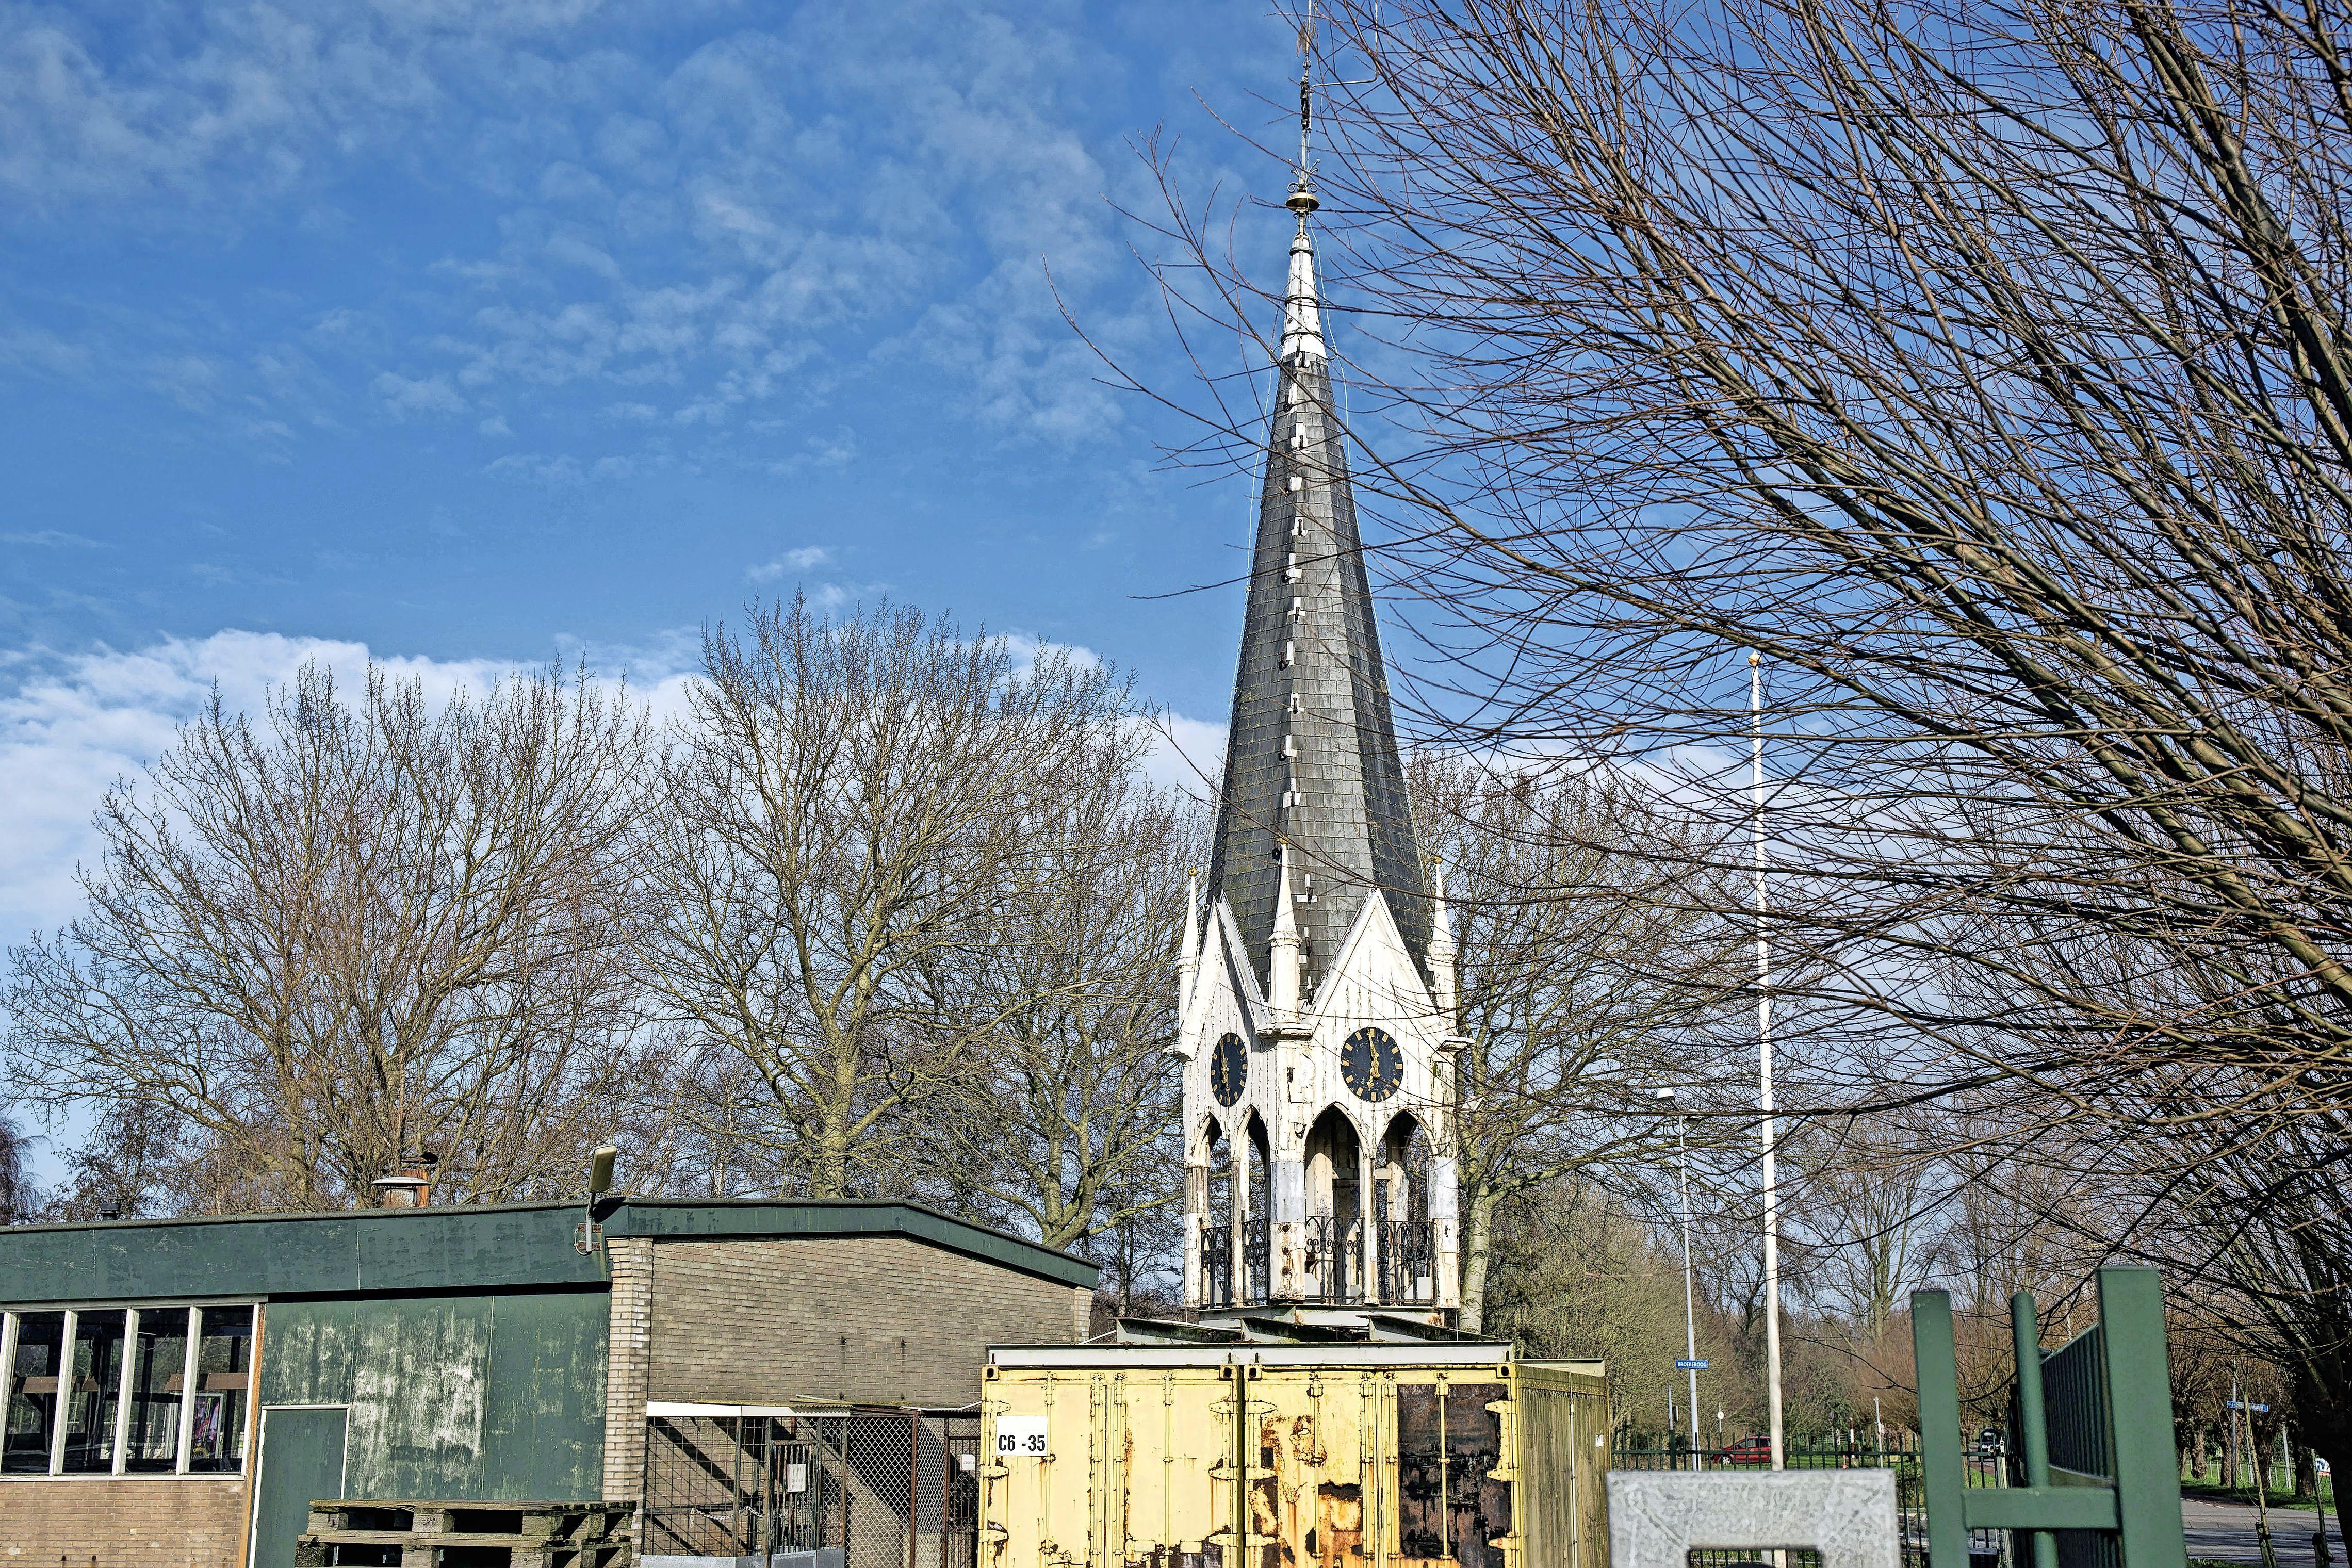 Het hing er nog heel erg om, maar oude torentje Haarlemse Deo-ziekenhuis krijgt tóch plek op kerk in Friese Vinkega